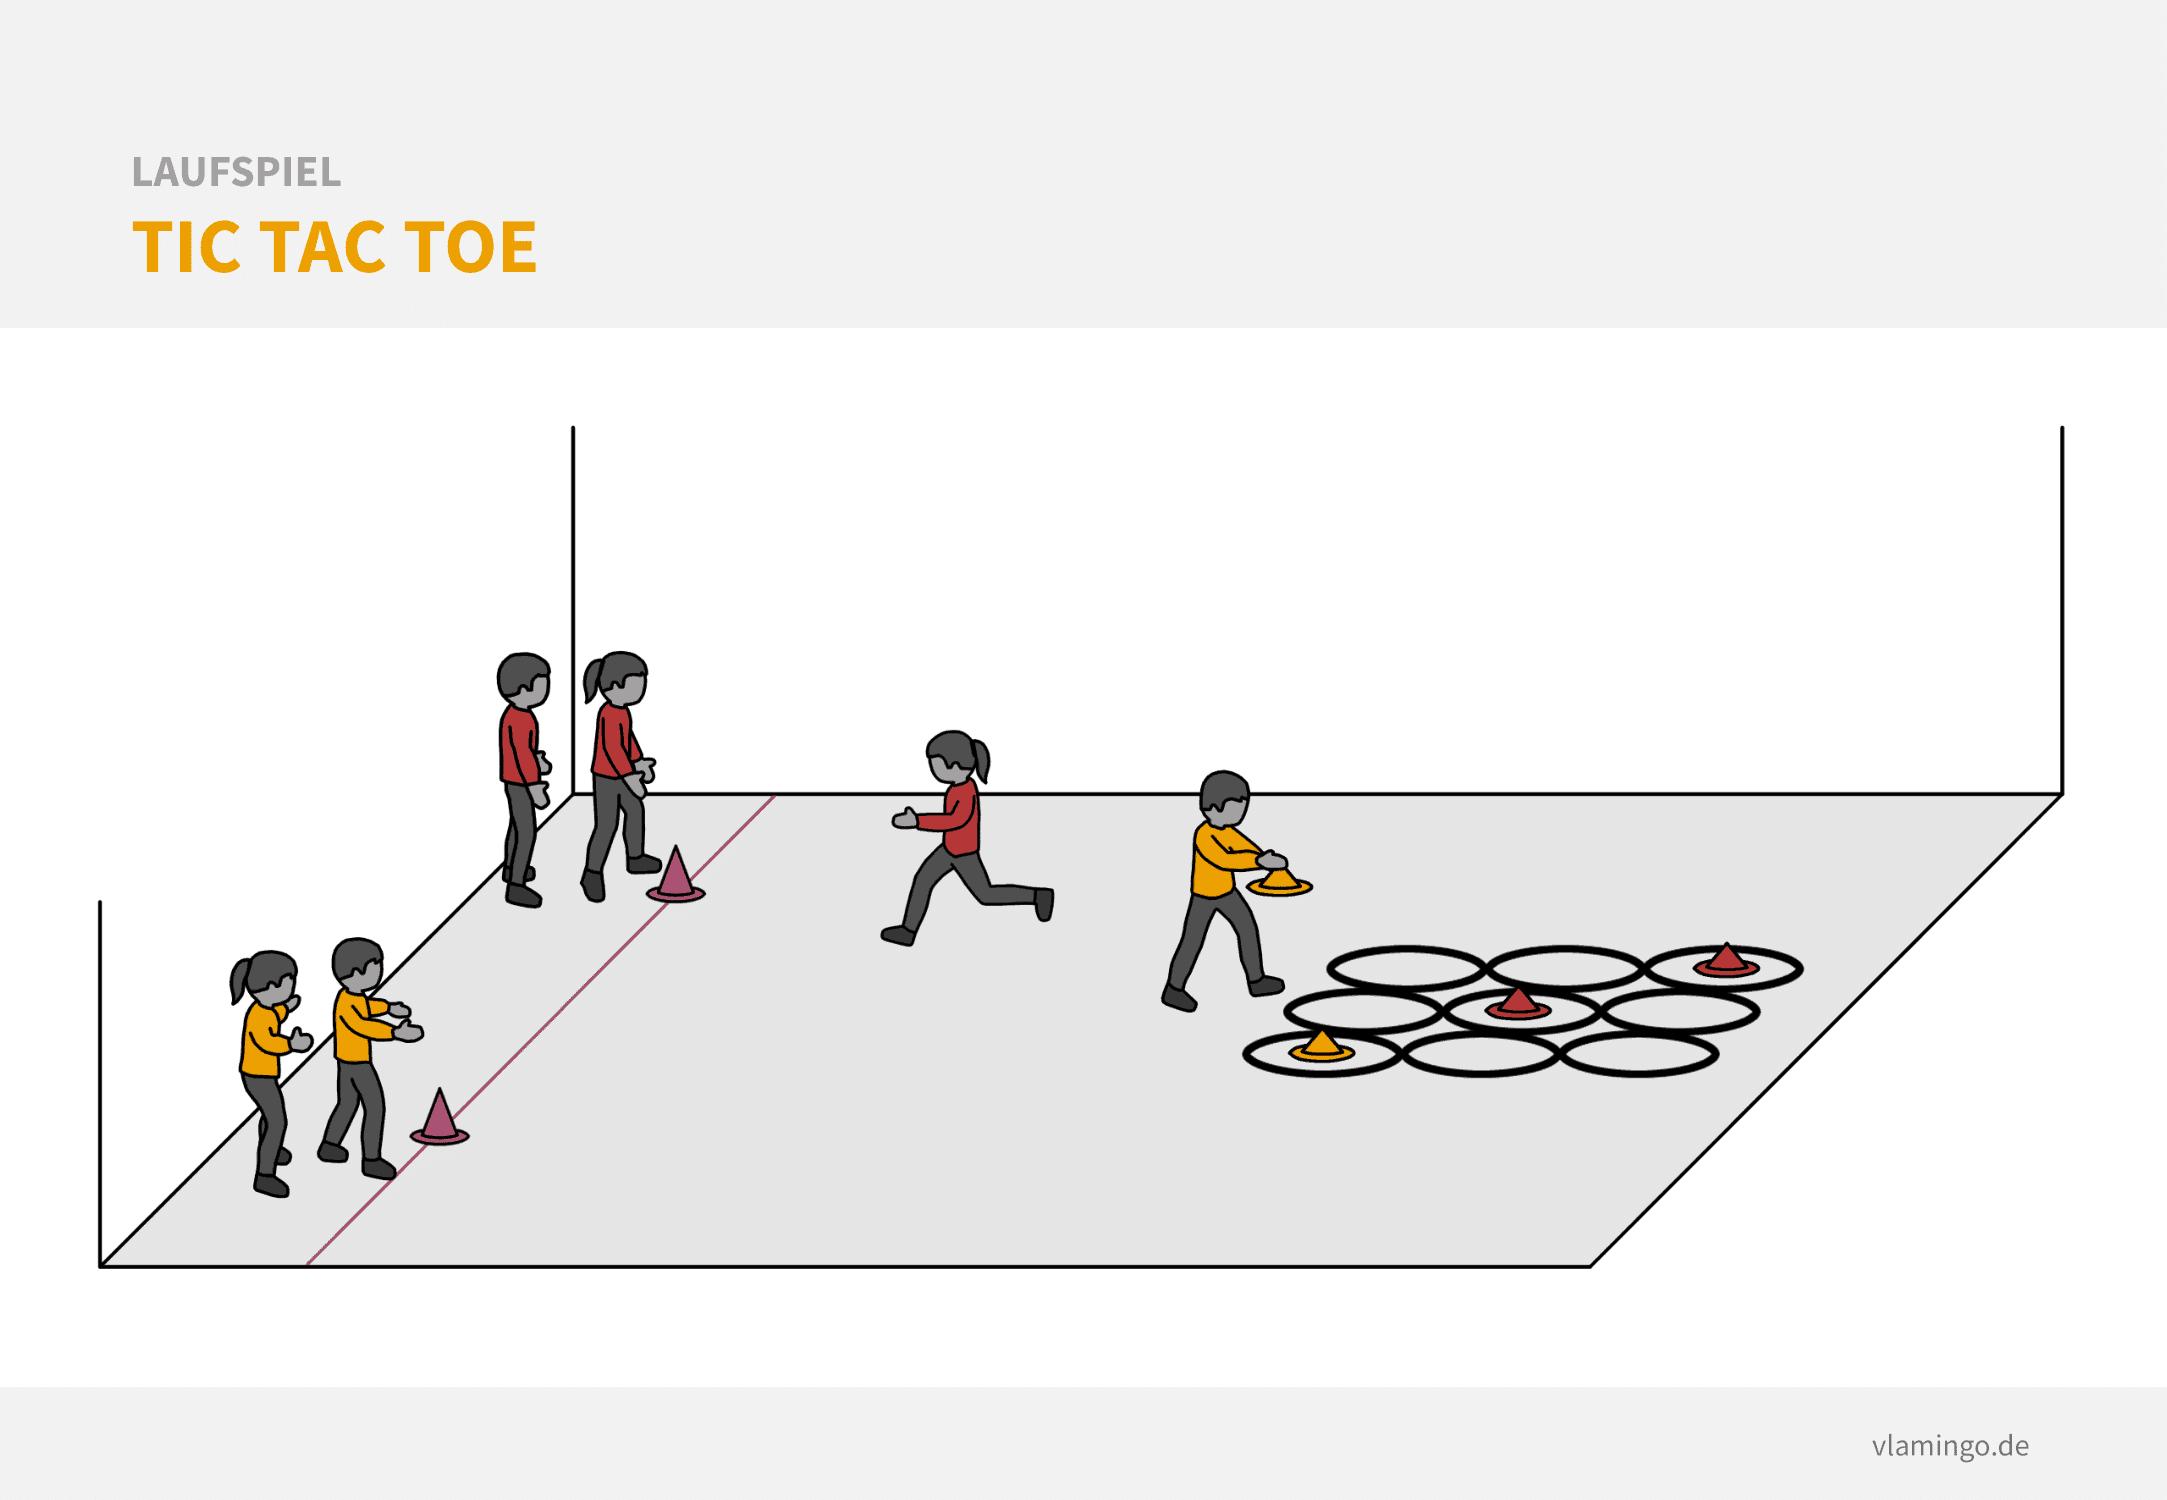 Laufspiel - TicTacToe